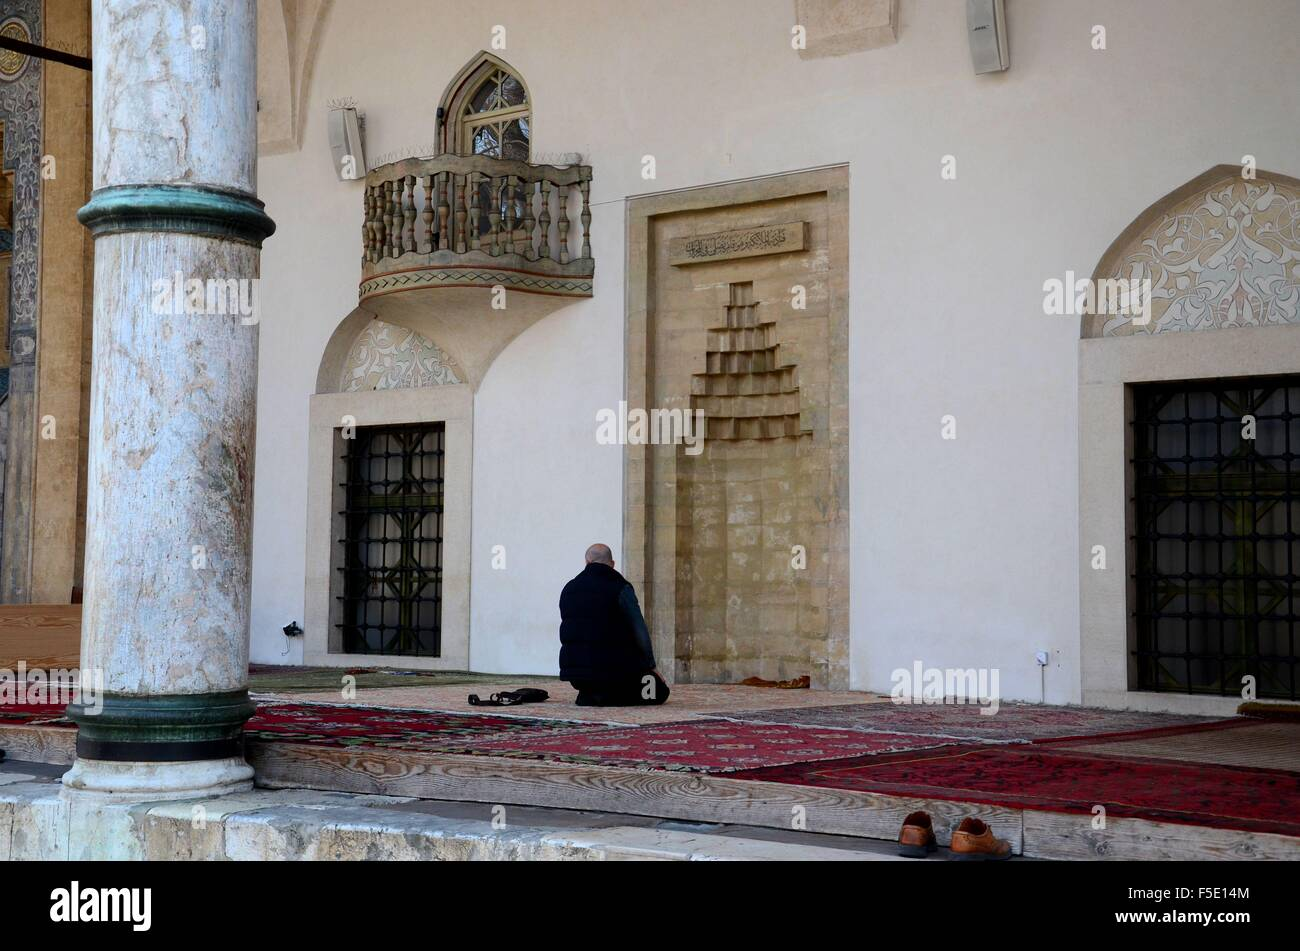 Lone Muslim man prays outdoors near mihrab and below balcony at Sarajevo mosque  Bosnia Hercegovina - Stock Image